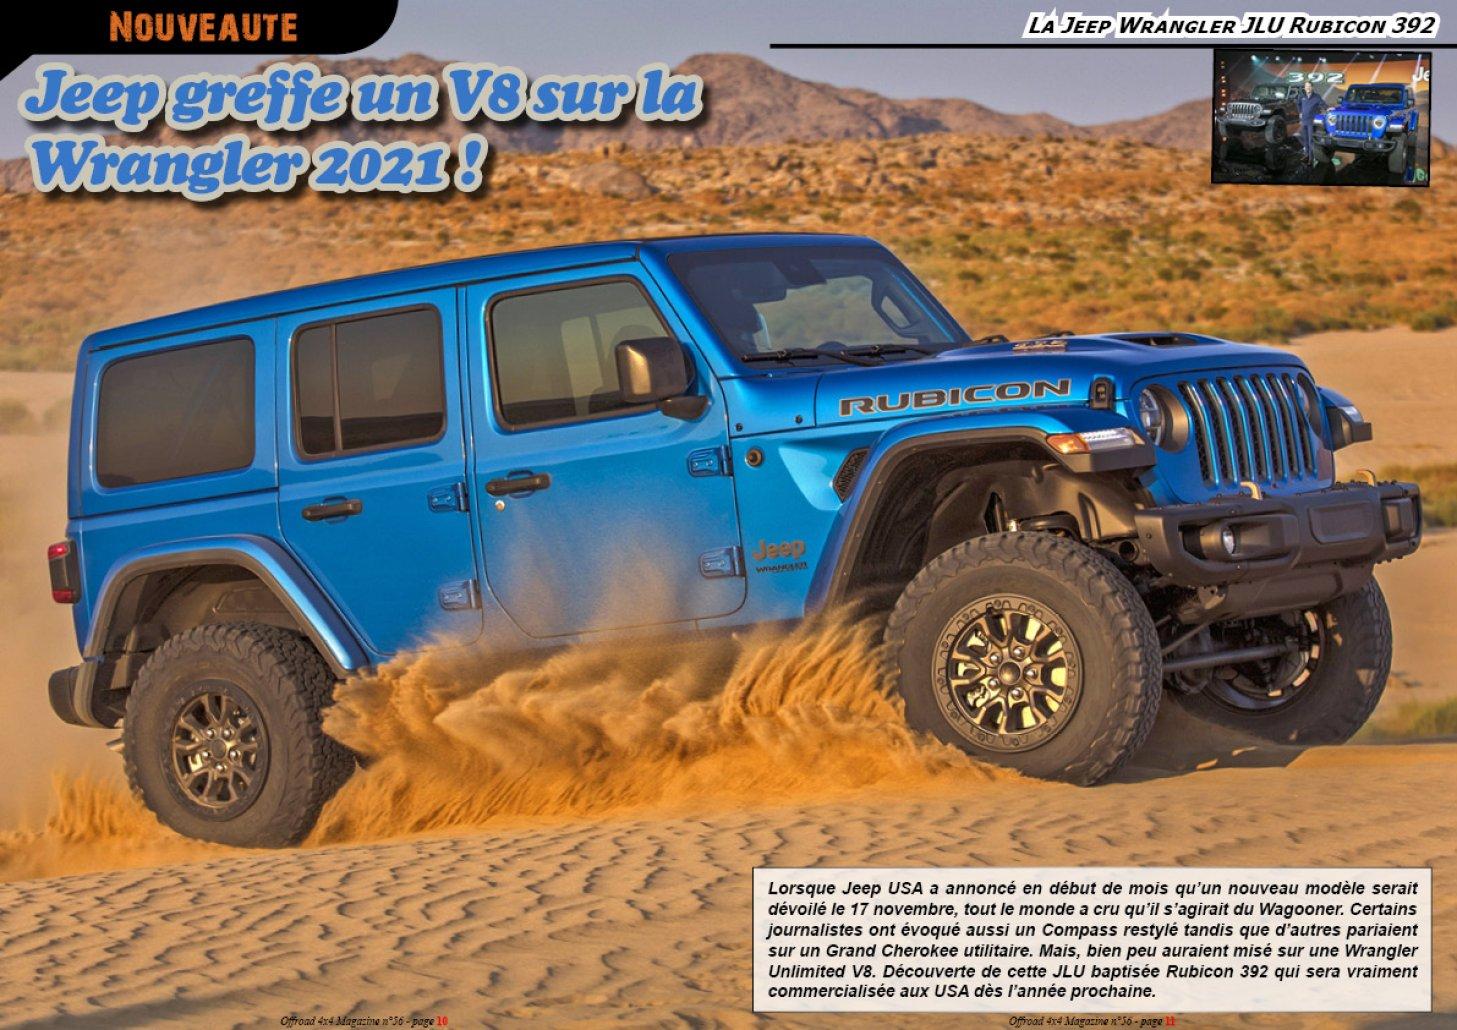 La Jeep Wrangler JLU Rubicon 392